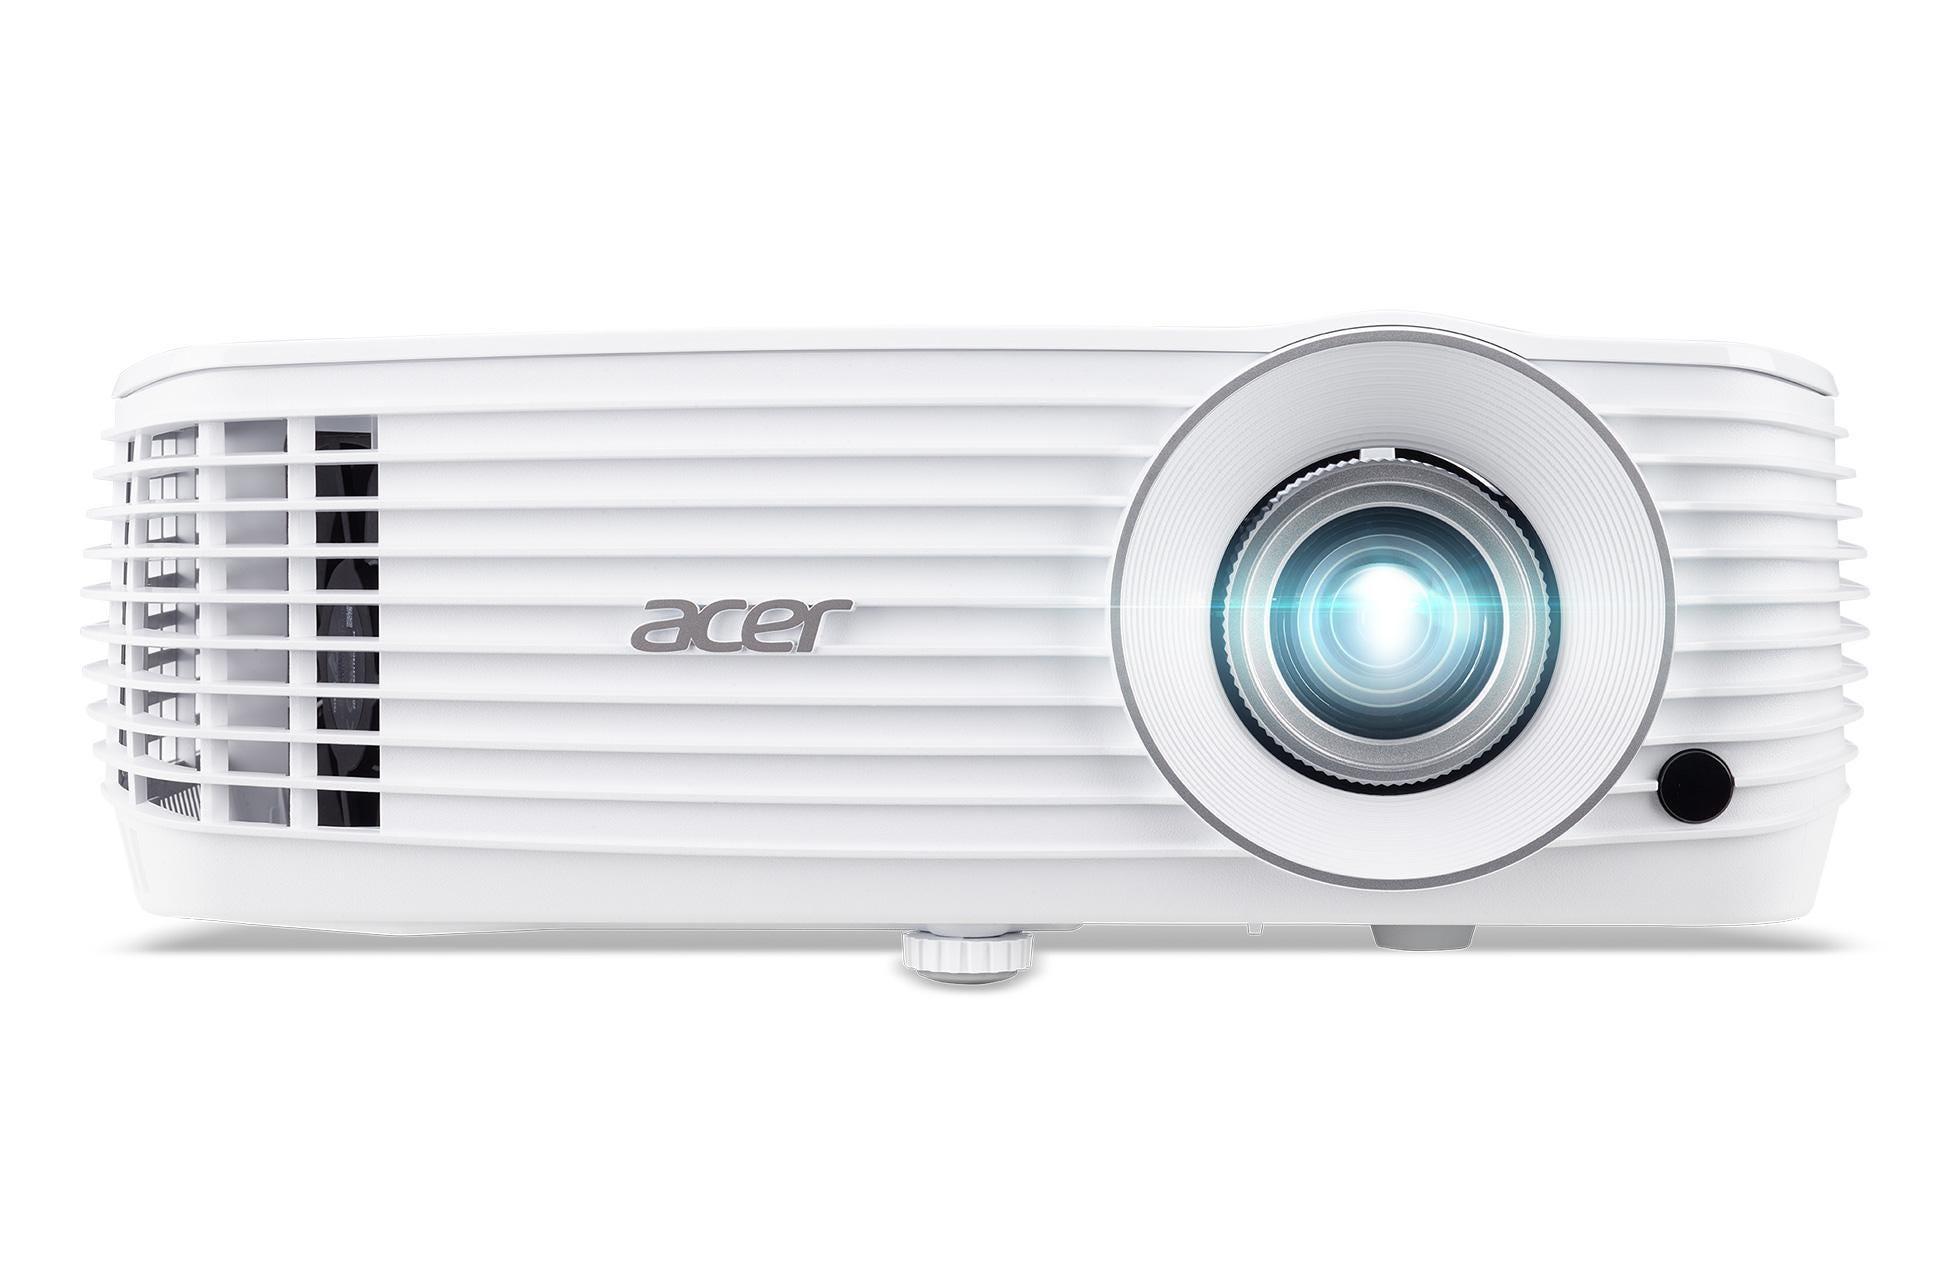 Acer V6810 projector